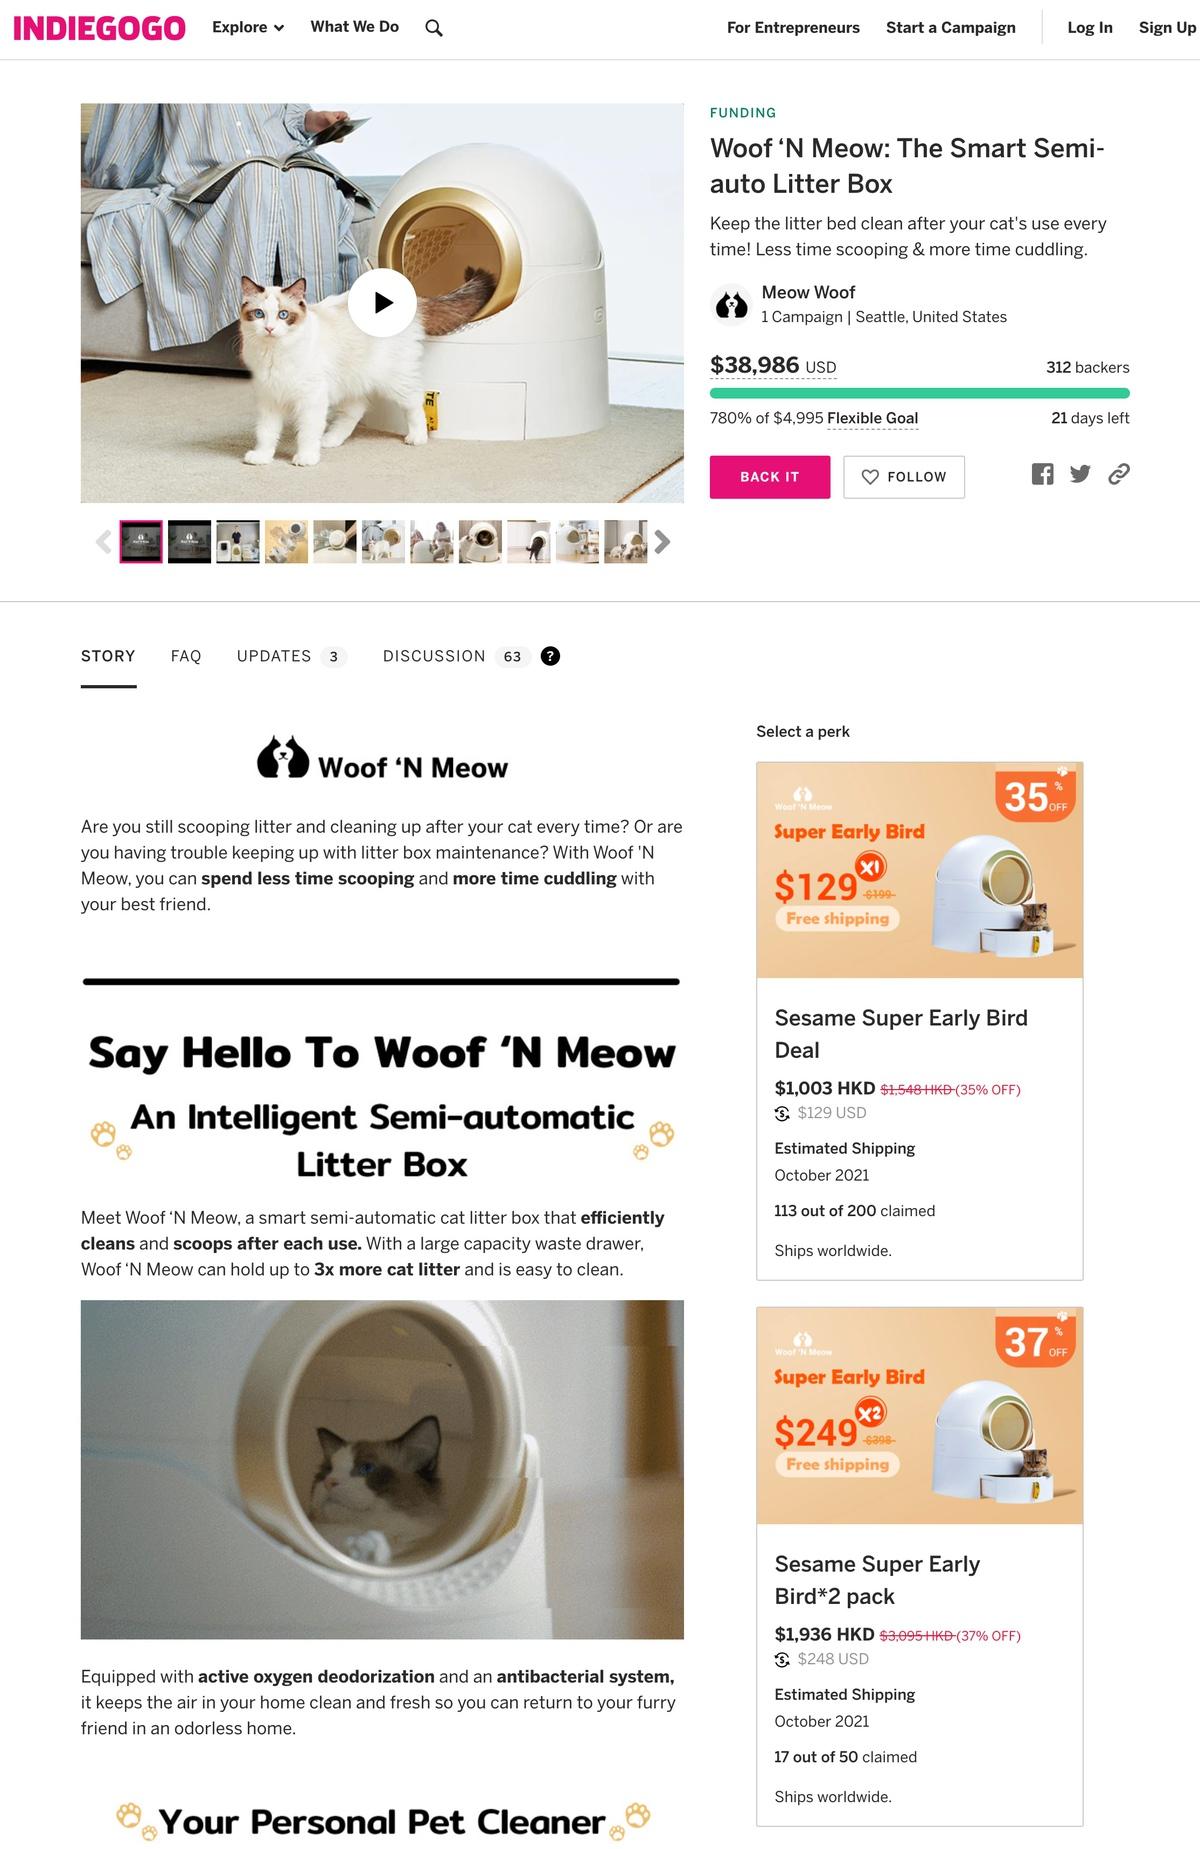 Woof n Meow Indiegogo